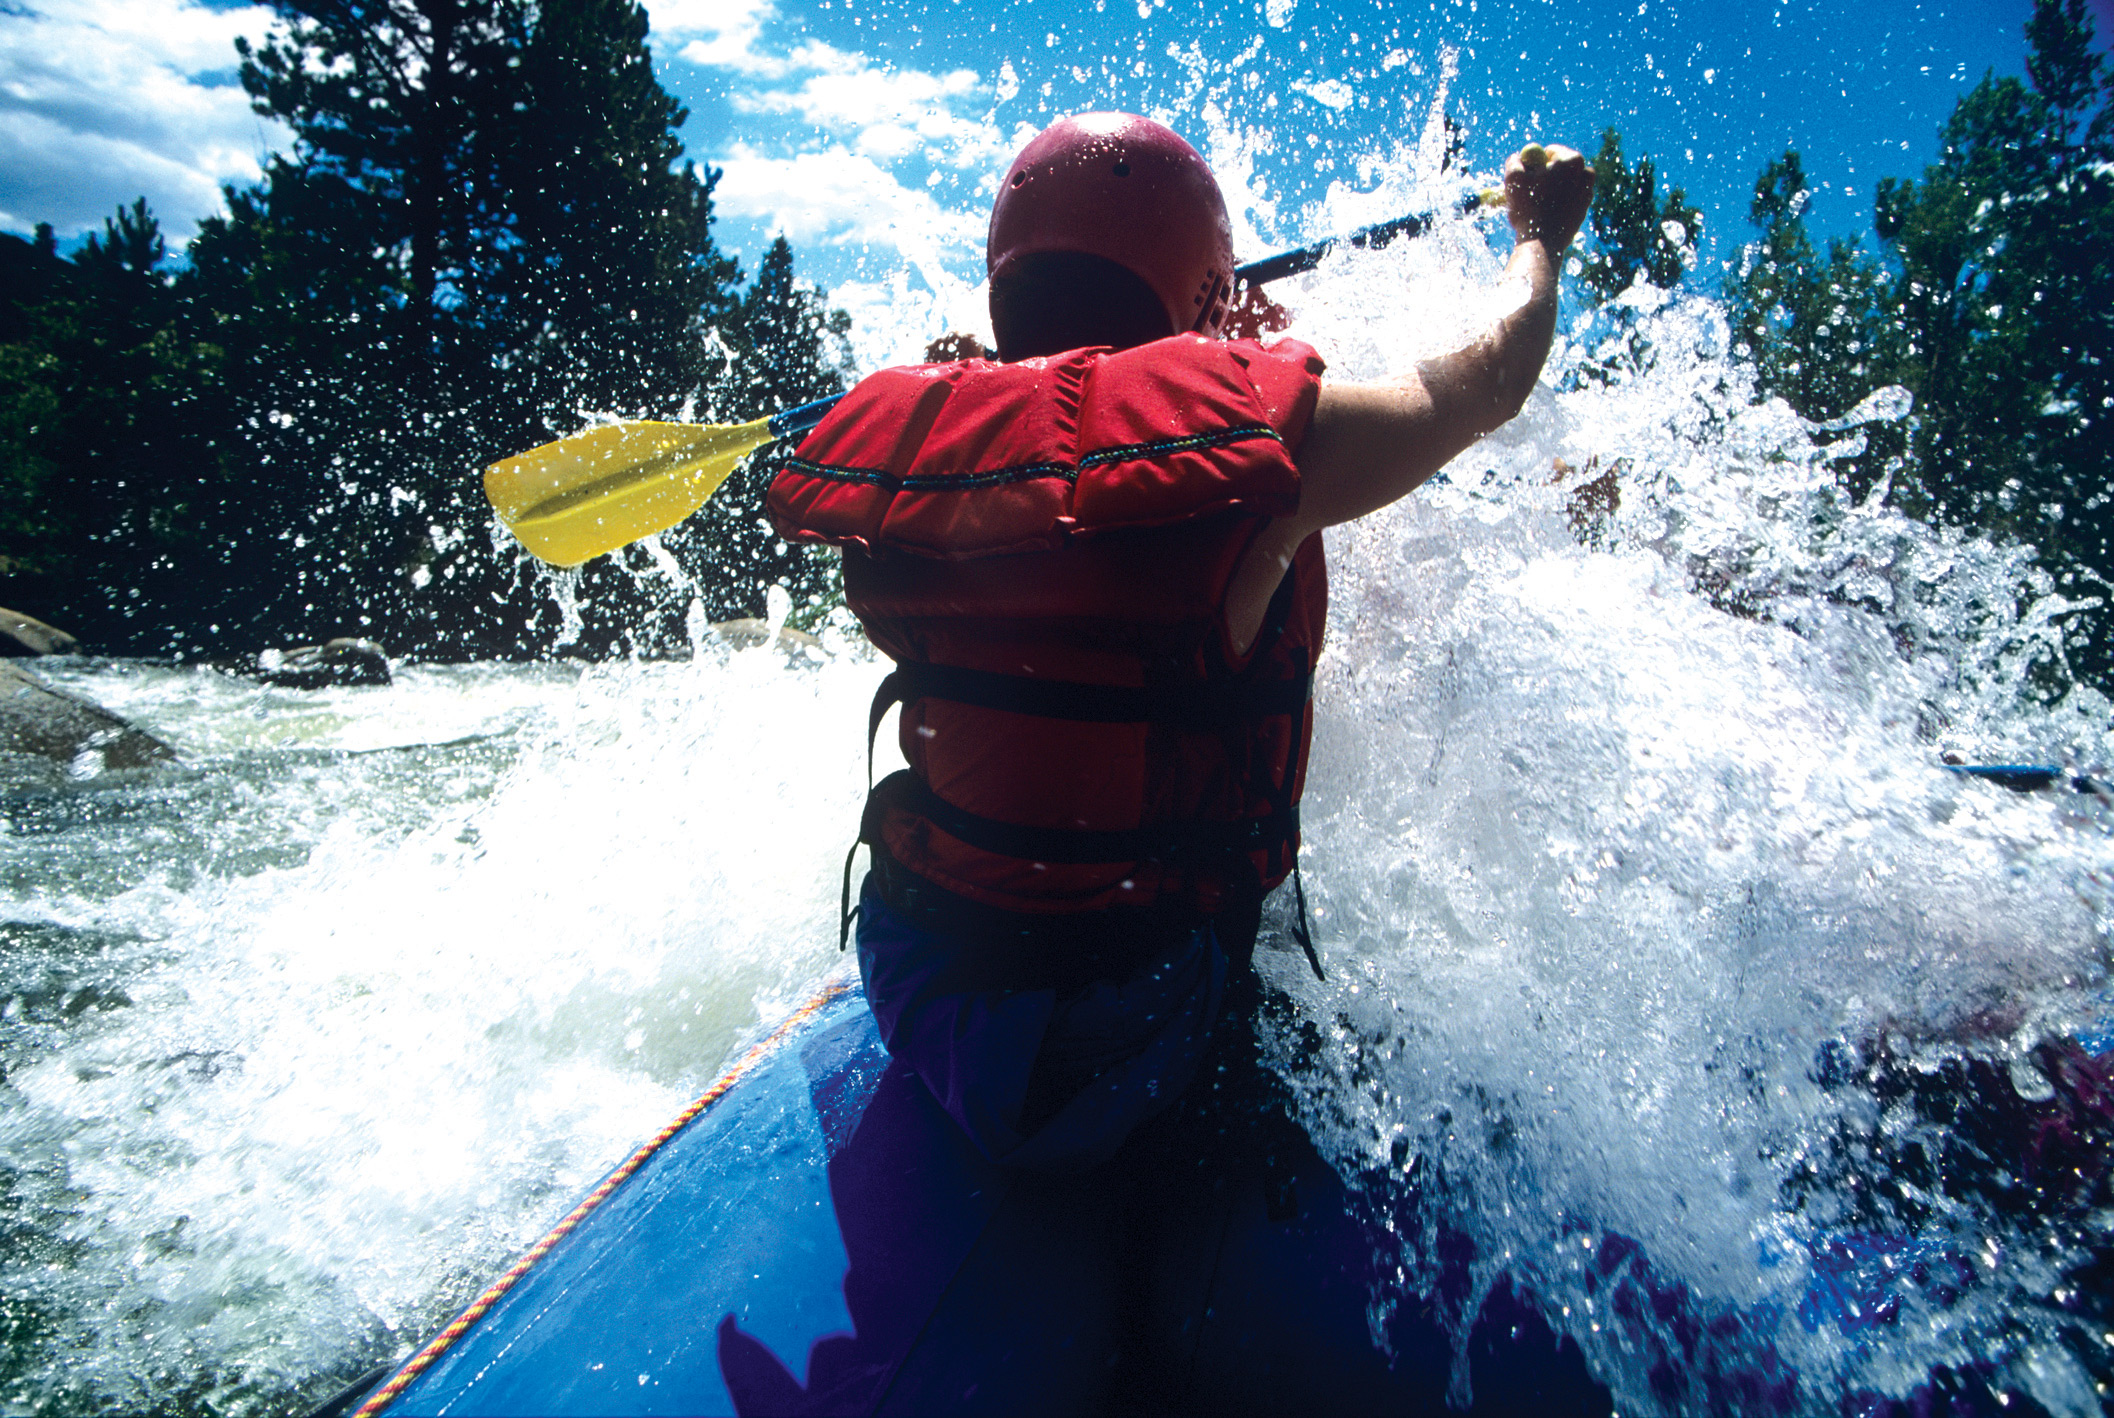 Making a splash. CREDIT: Mike Watson Images